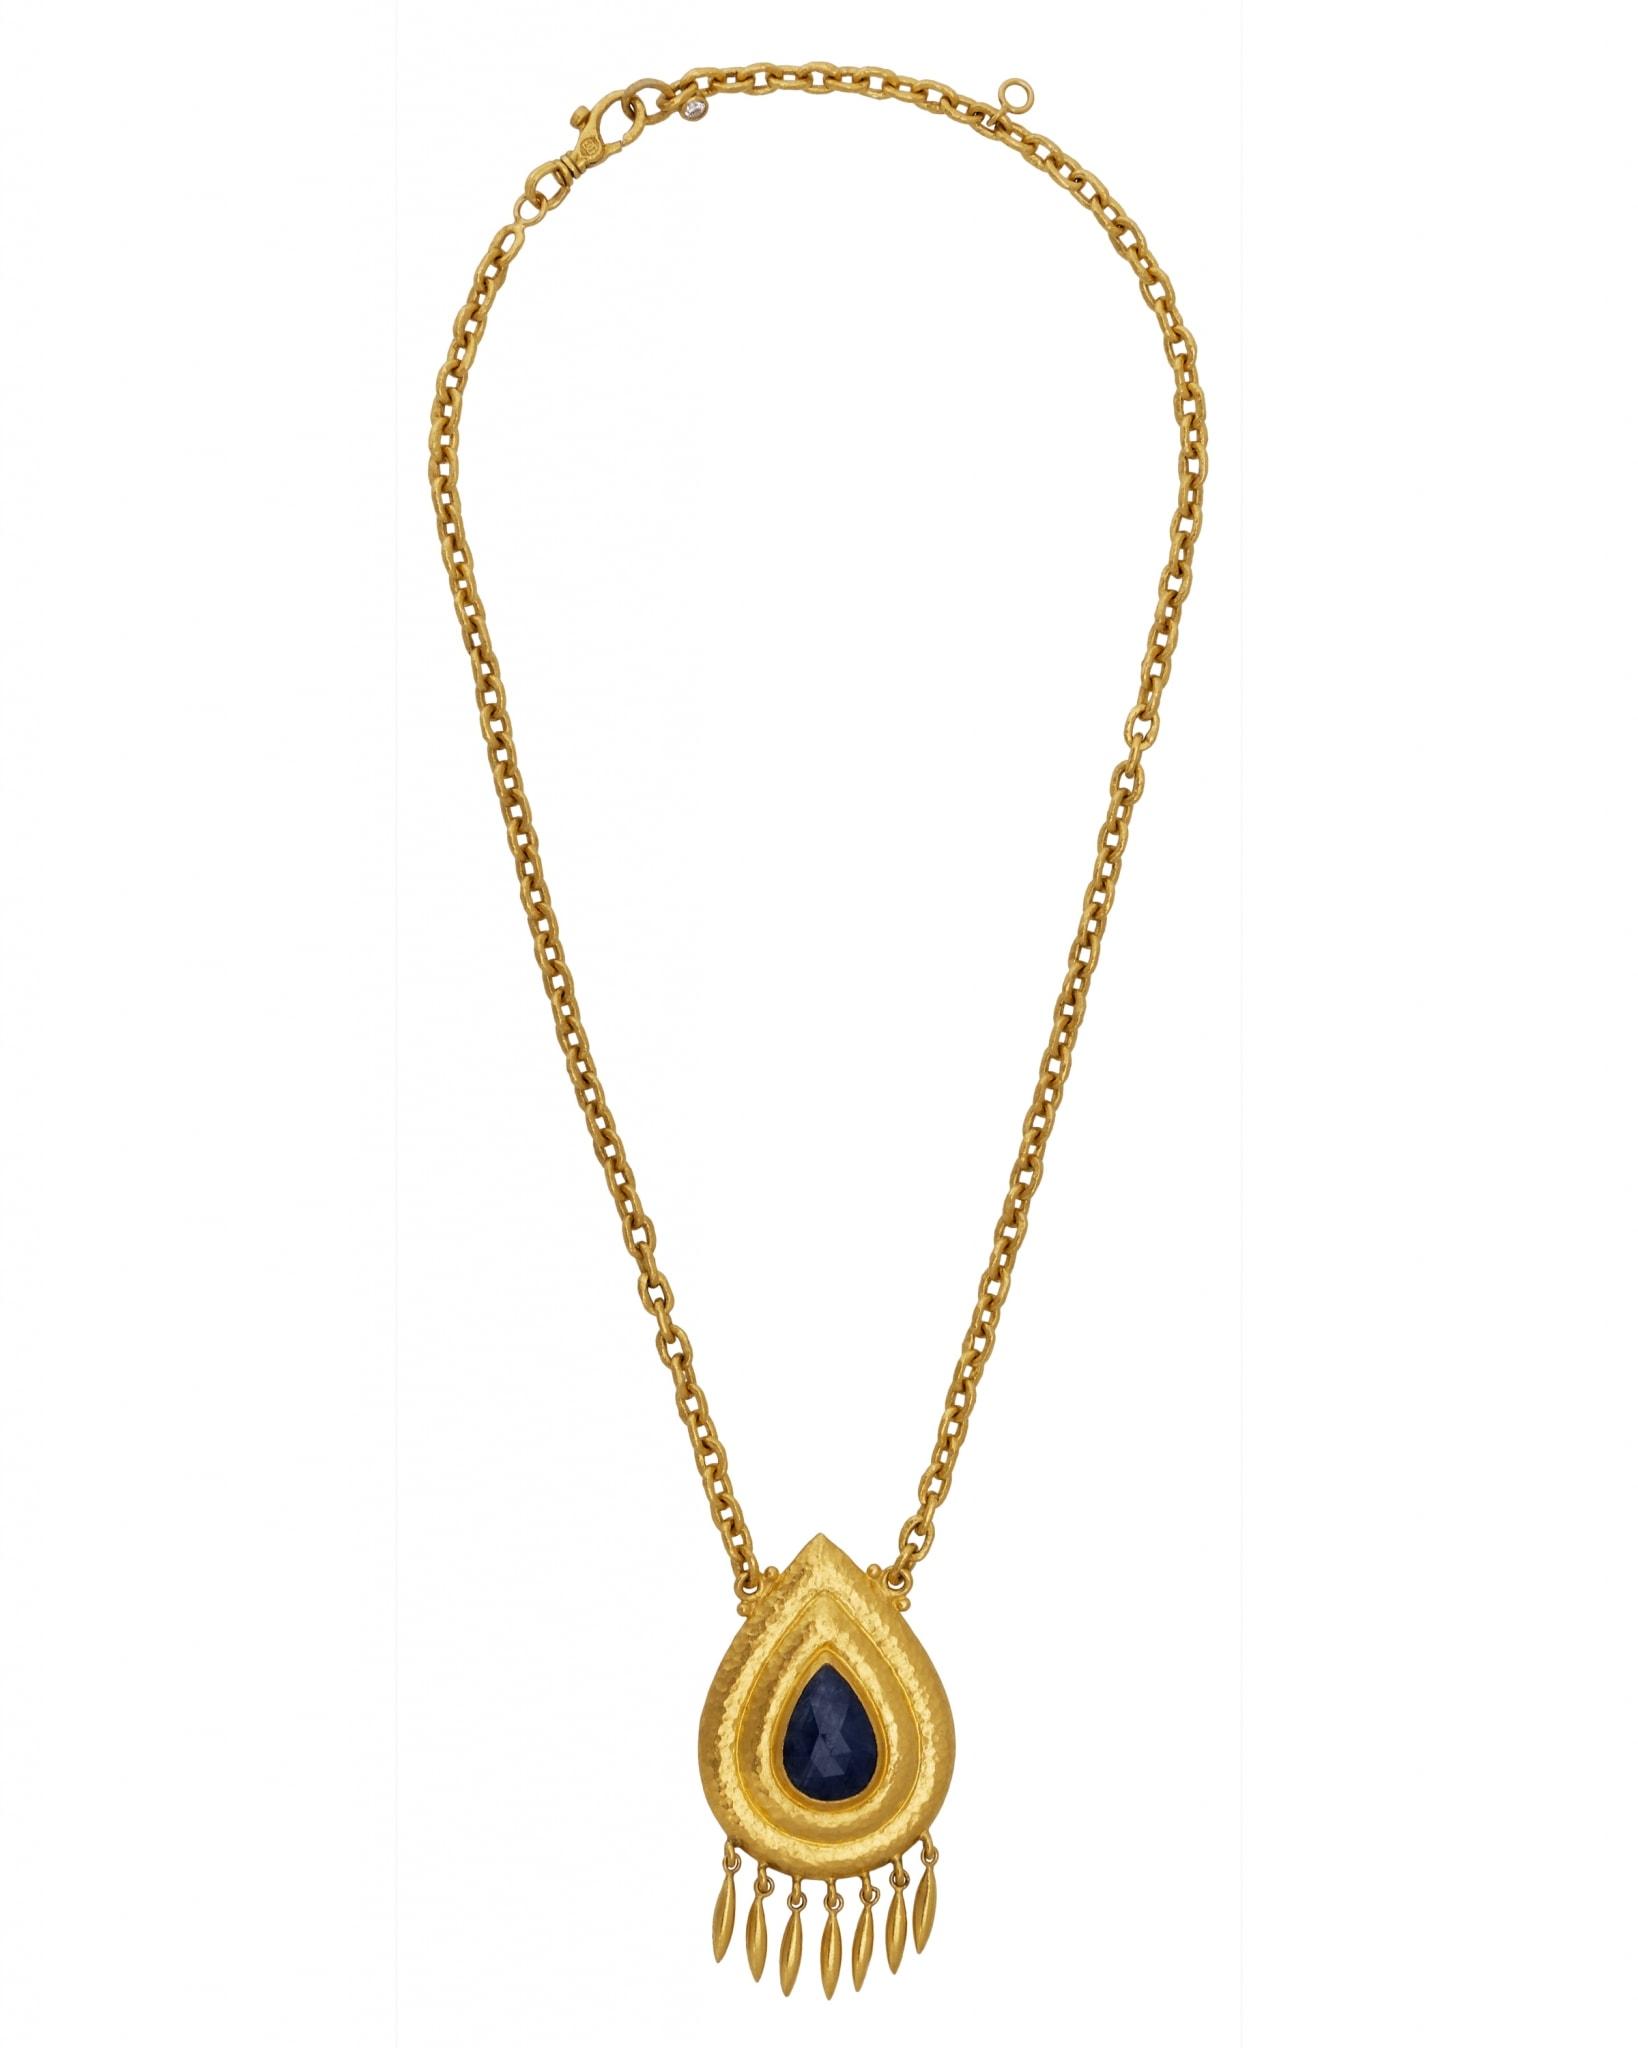 GURHAN – 24K Yellow Gold Sapphire Necklace N-U8691-SA